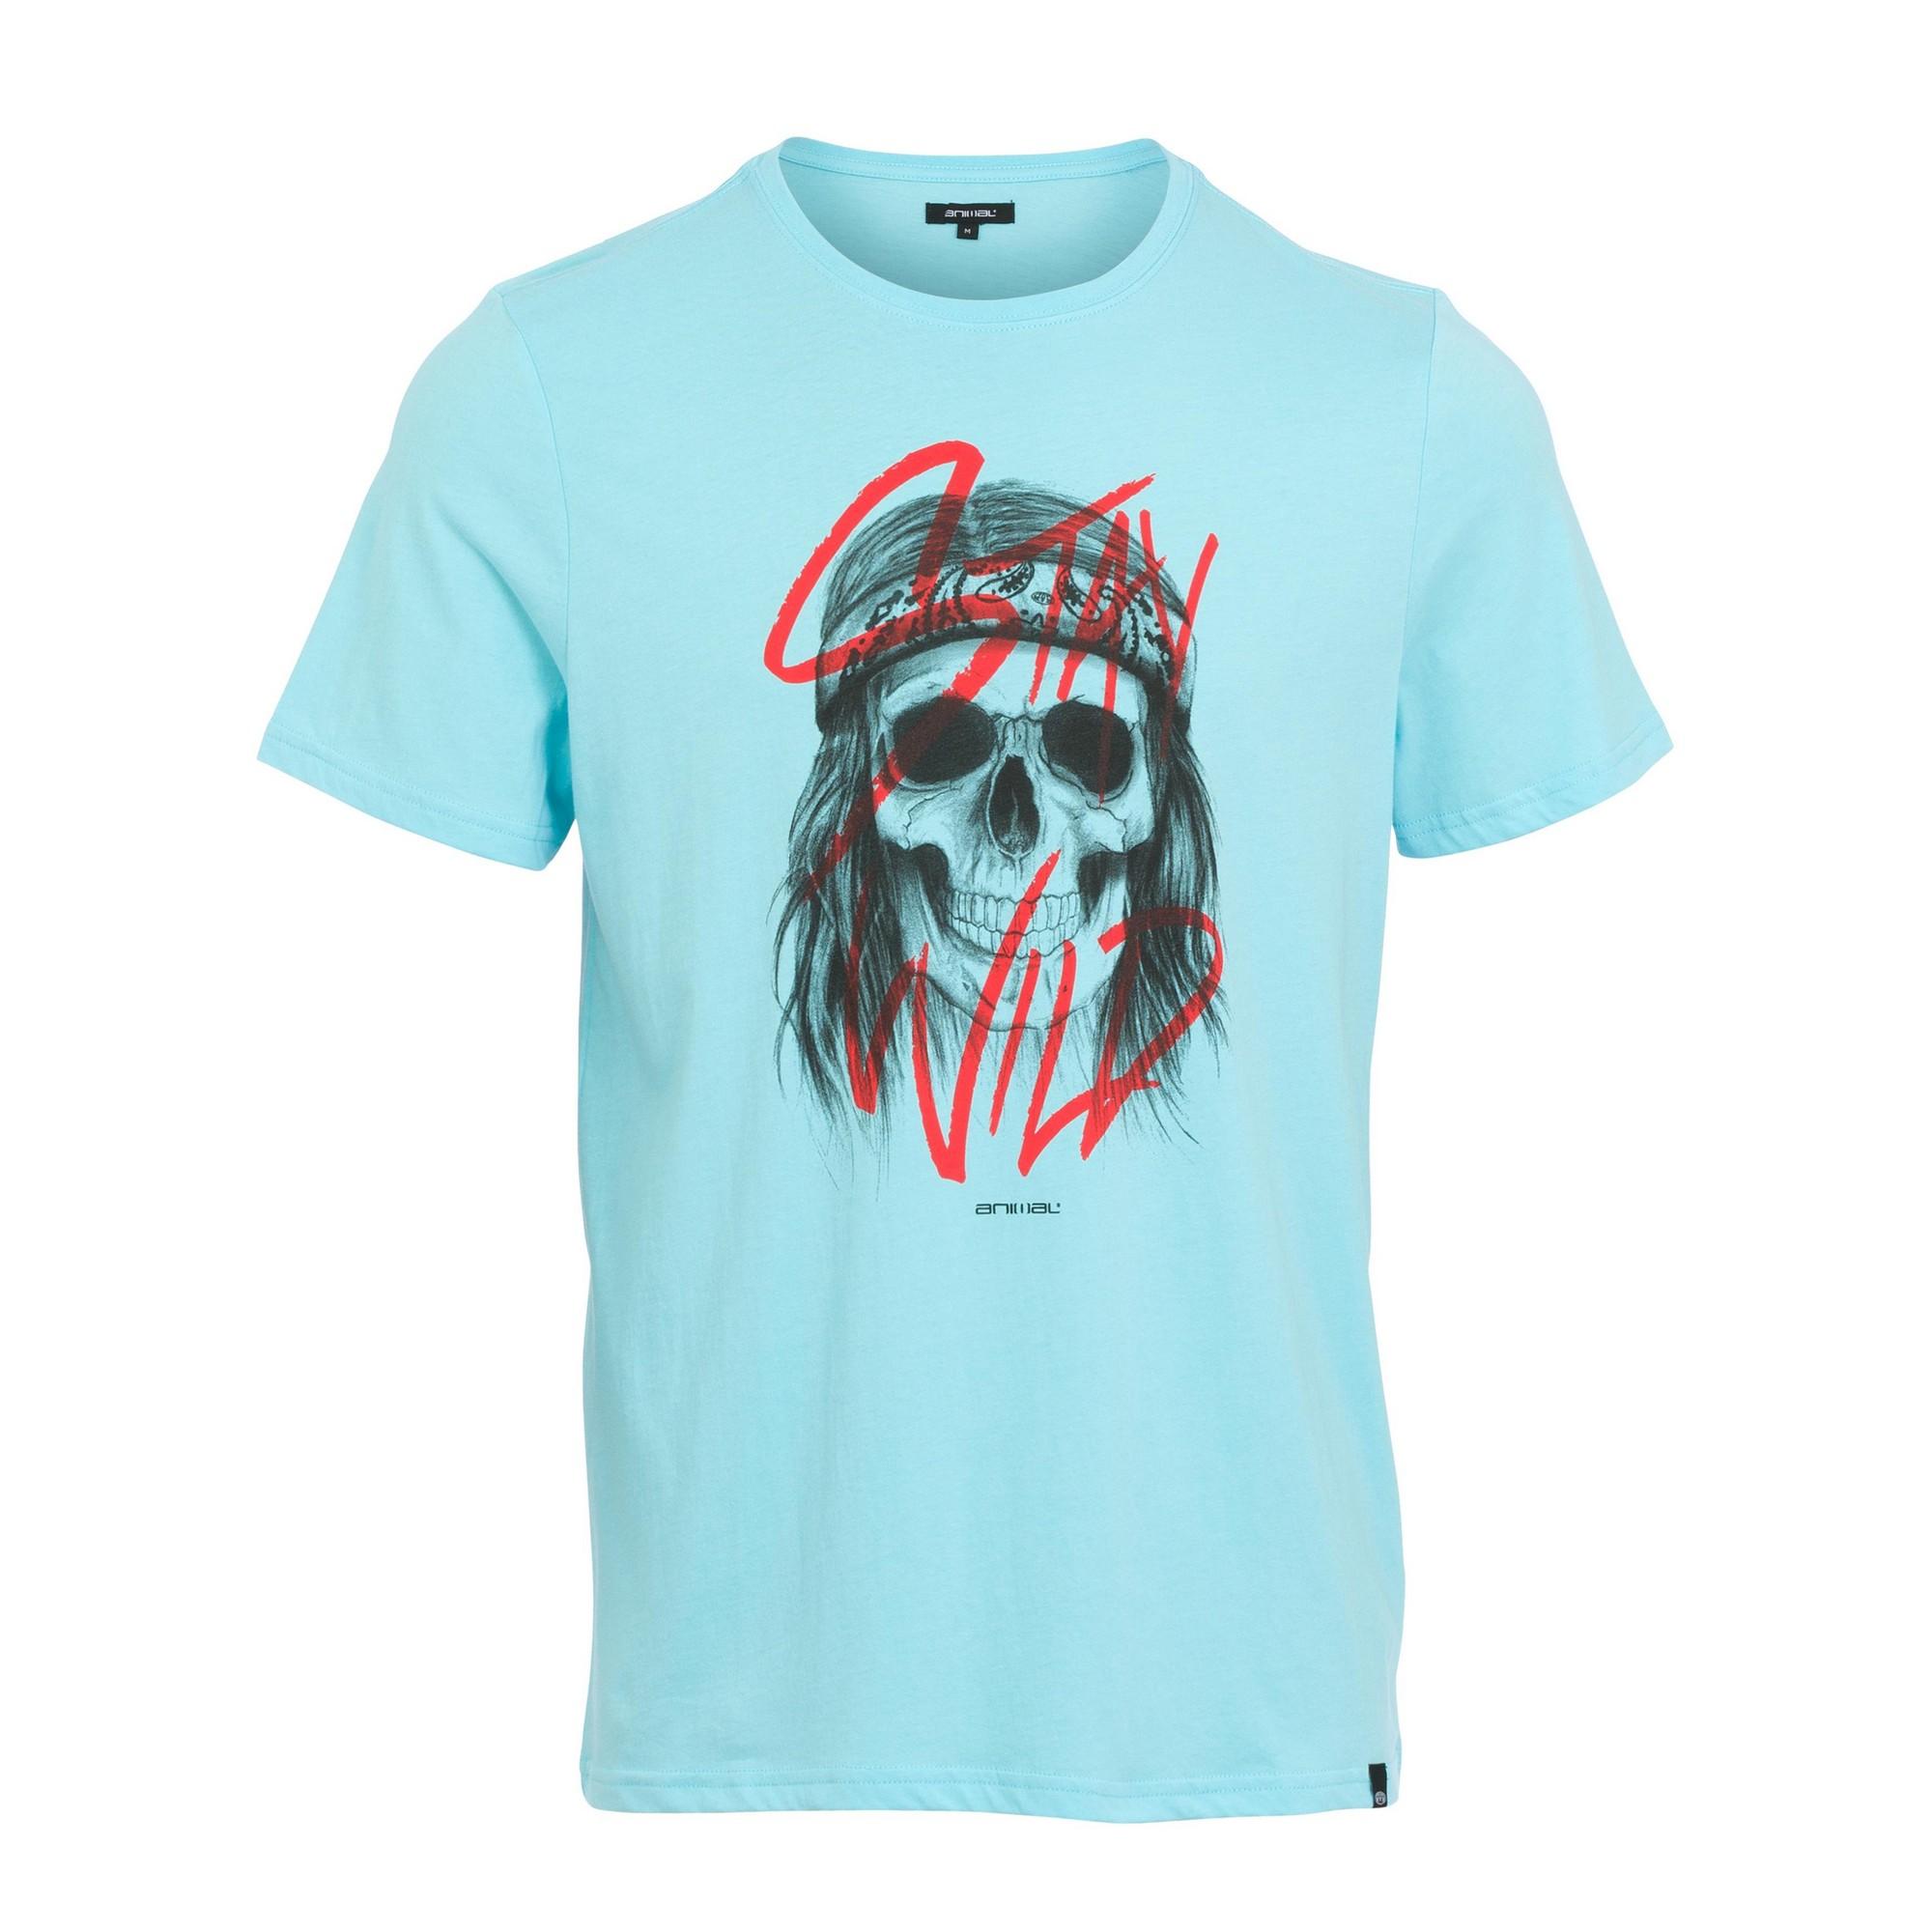 Animal-Camiseta-de-Manga-Corta-Diseno-Rocco-para-Hombre